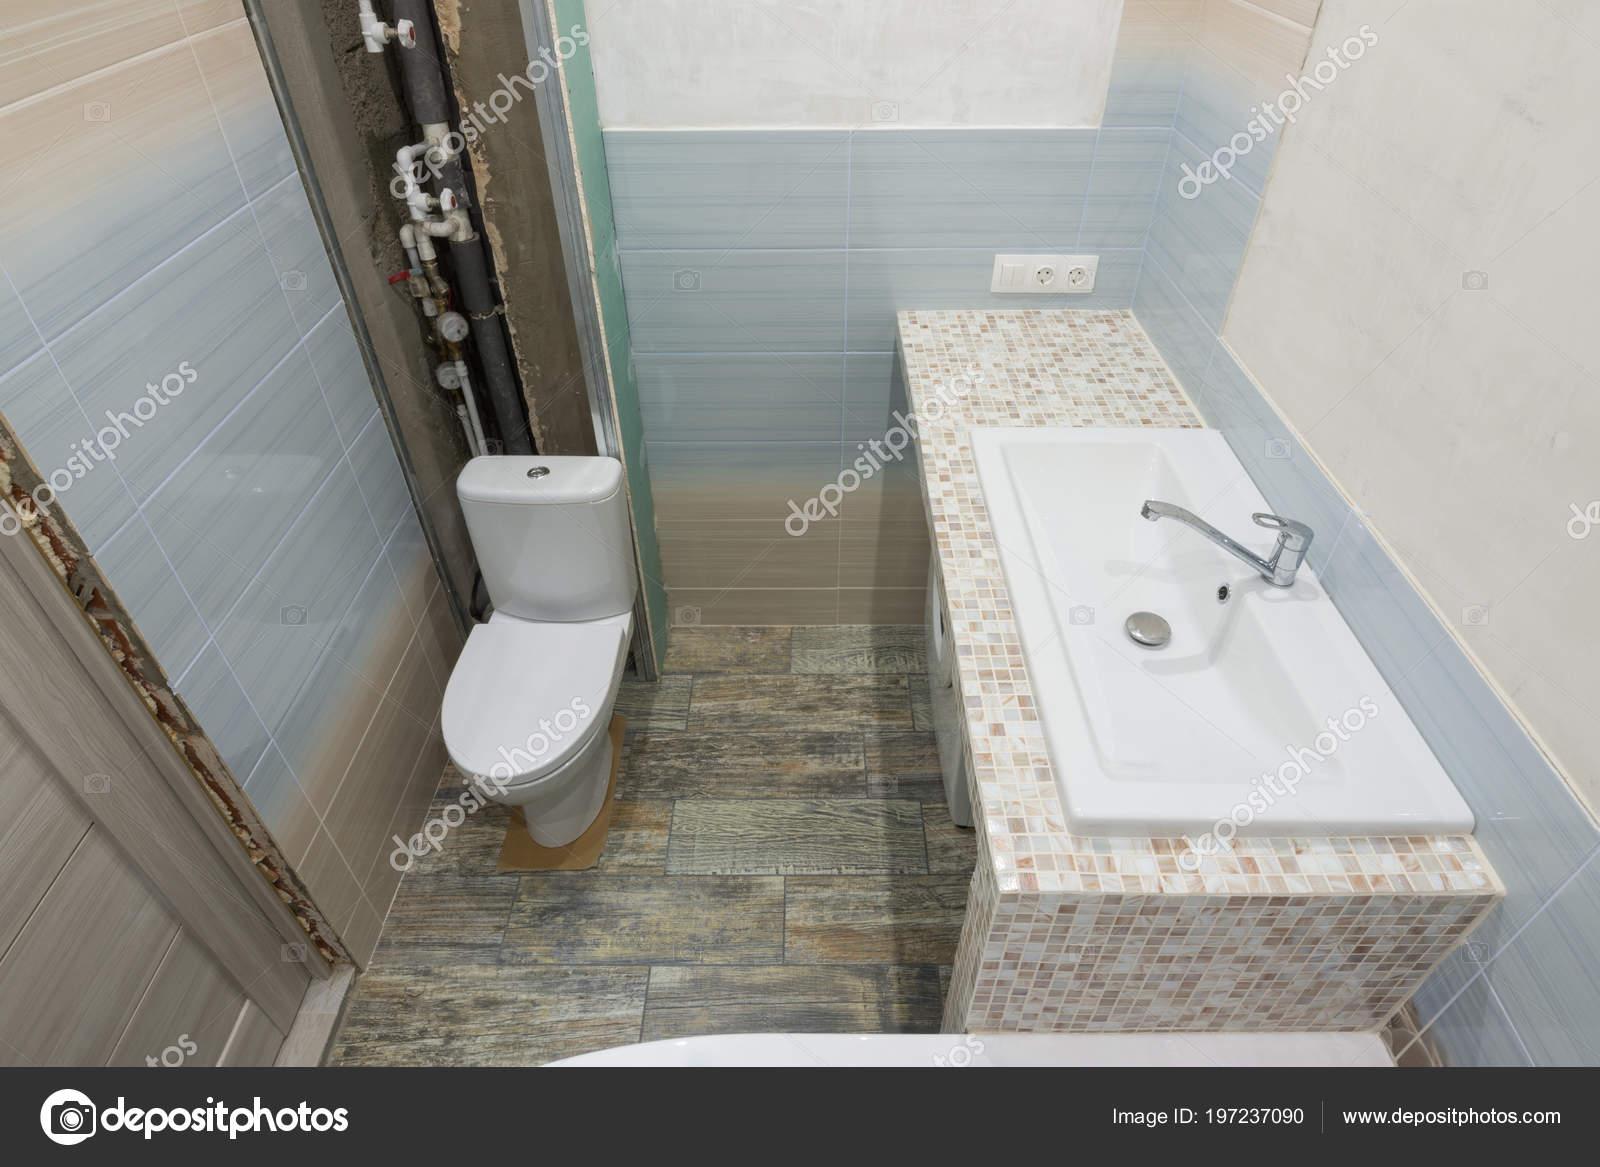 Repair Bathroom Top View Toilet Washbasin Stock Photo C Madhourses